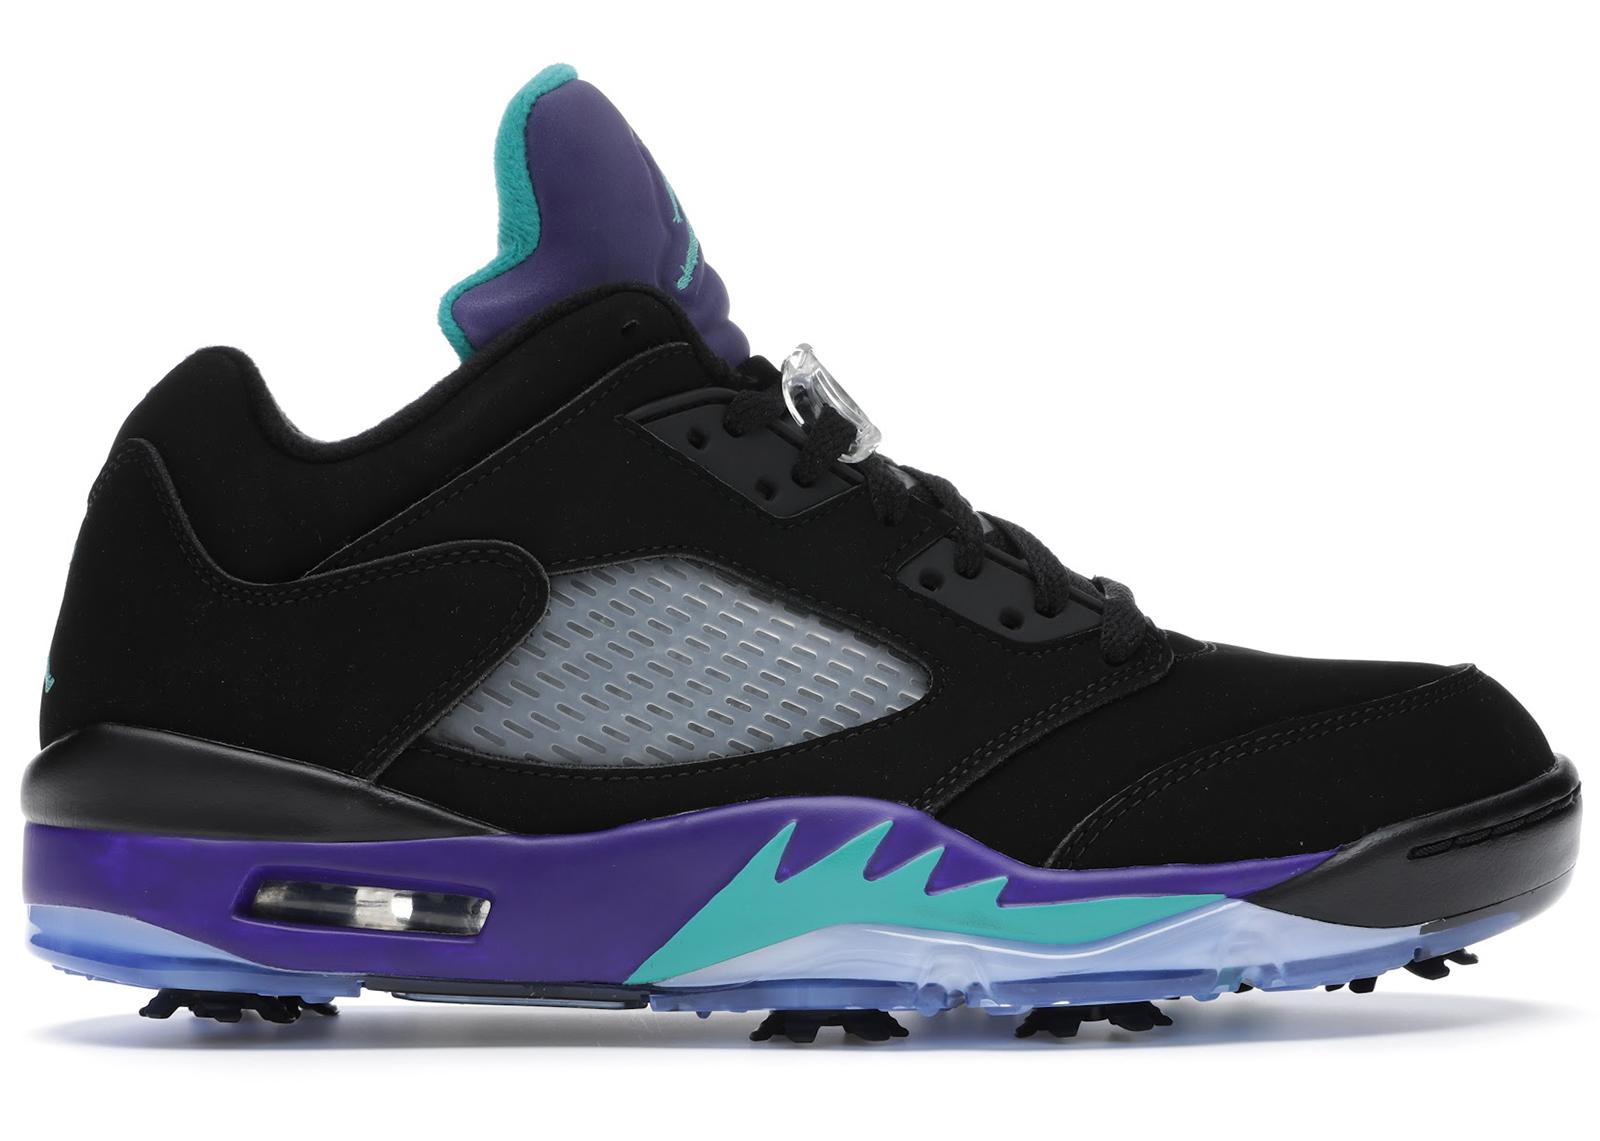 Jordan 5 Retro Low Golf Black Grape